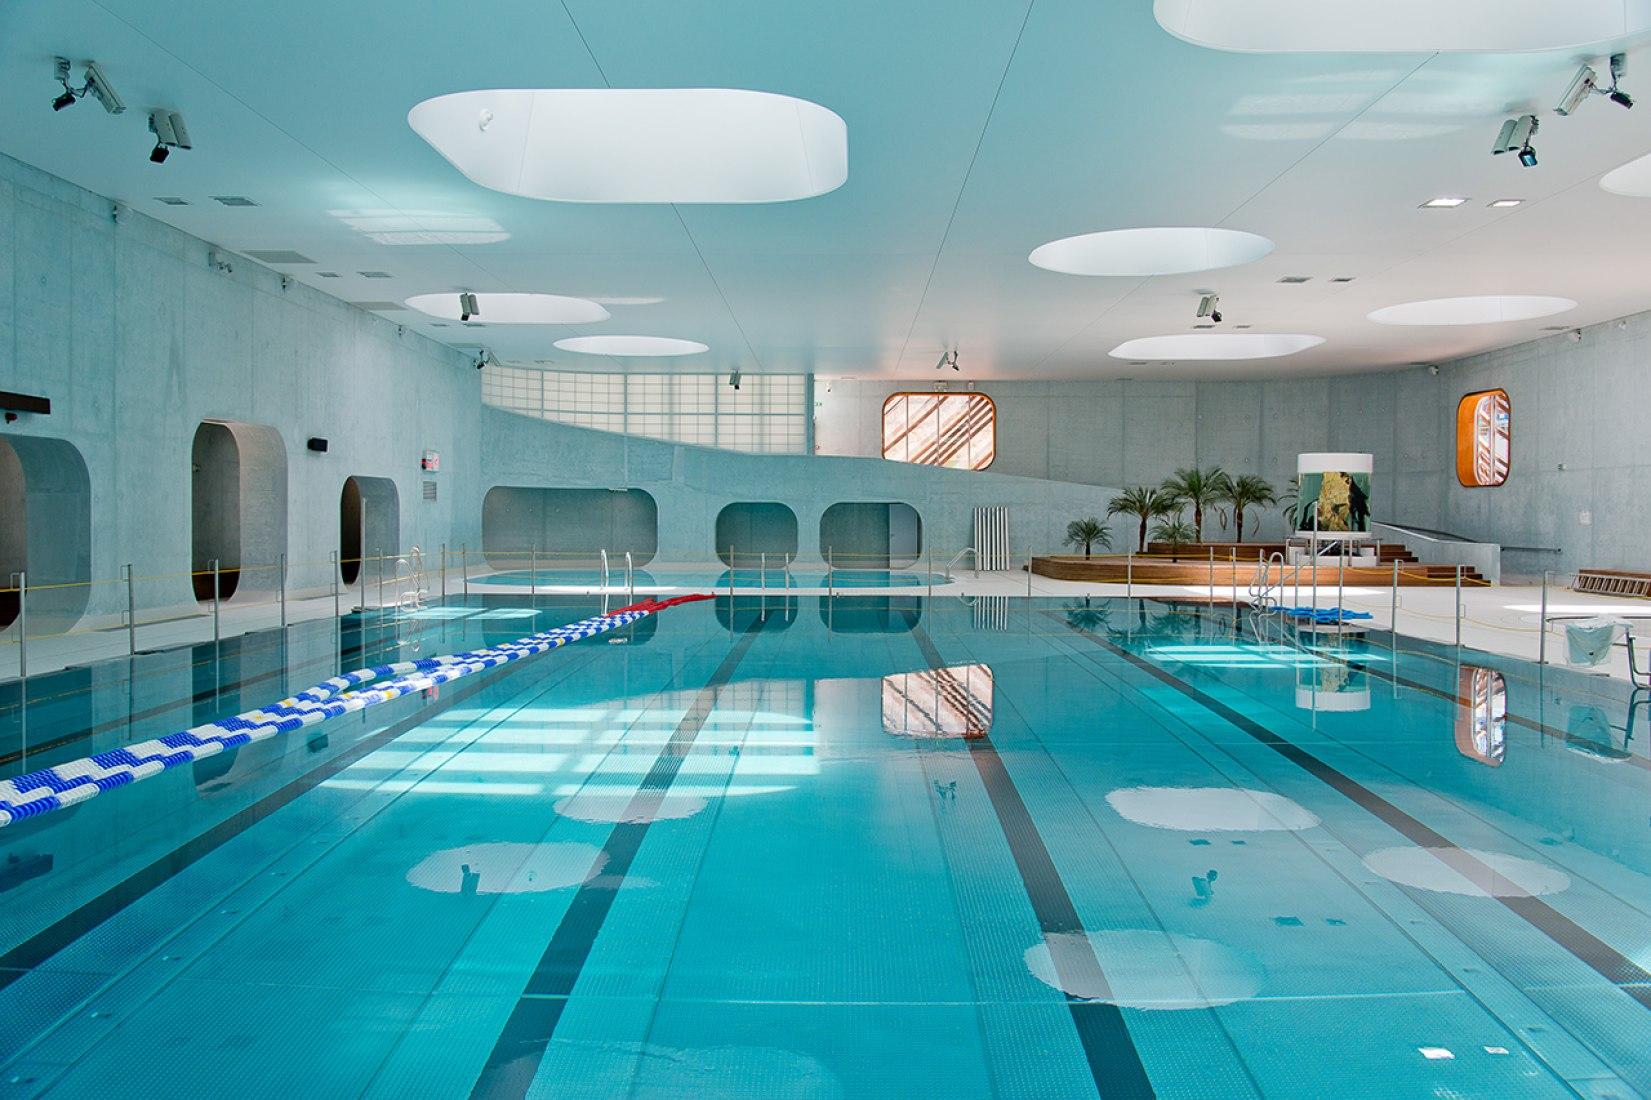 Feng Shui swimming pool by Mikou Studio. Photograph © Ville d'Issy-les-Moulineaux.